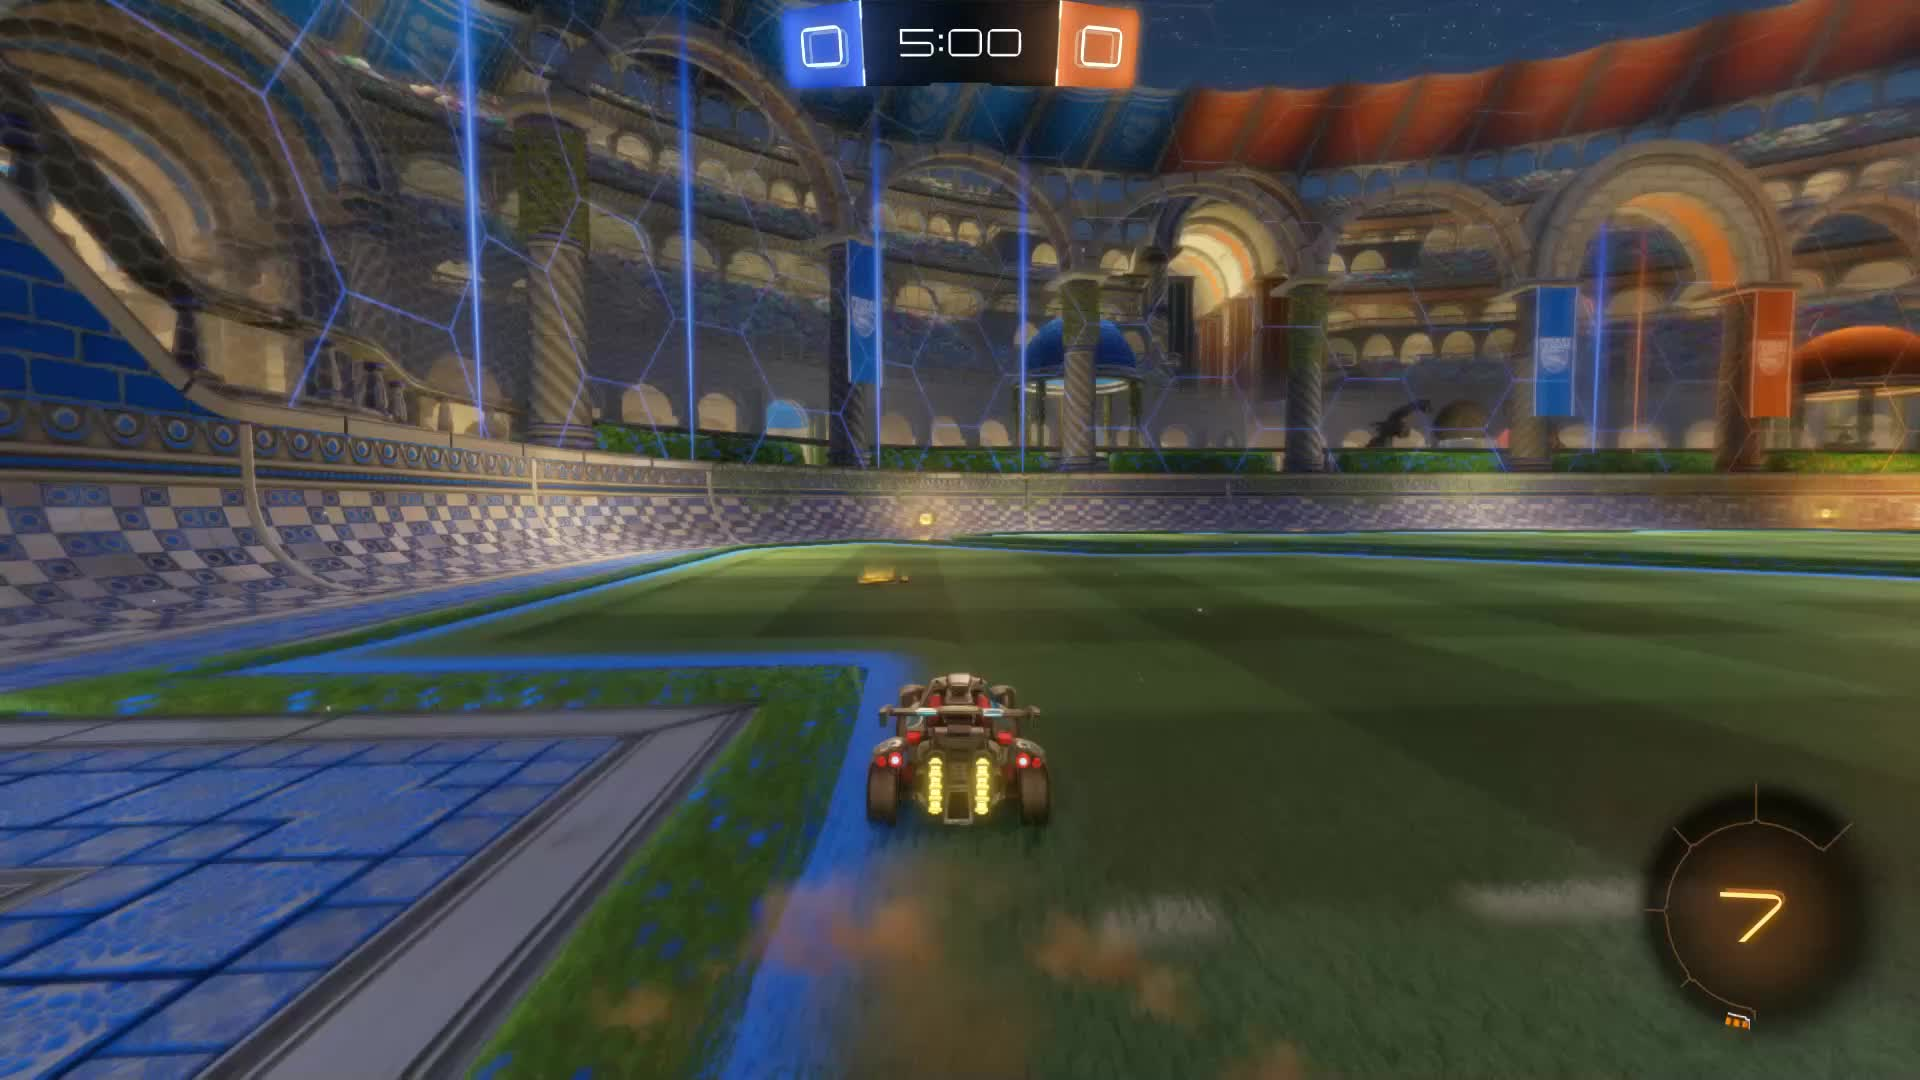 CodelsYT, Gif Your Game, GifYourGame, Goal, Rocket League, RocketLeague, ⏱️ Goal 1: Minicius GIFs